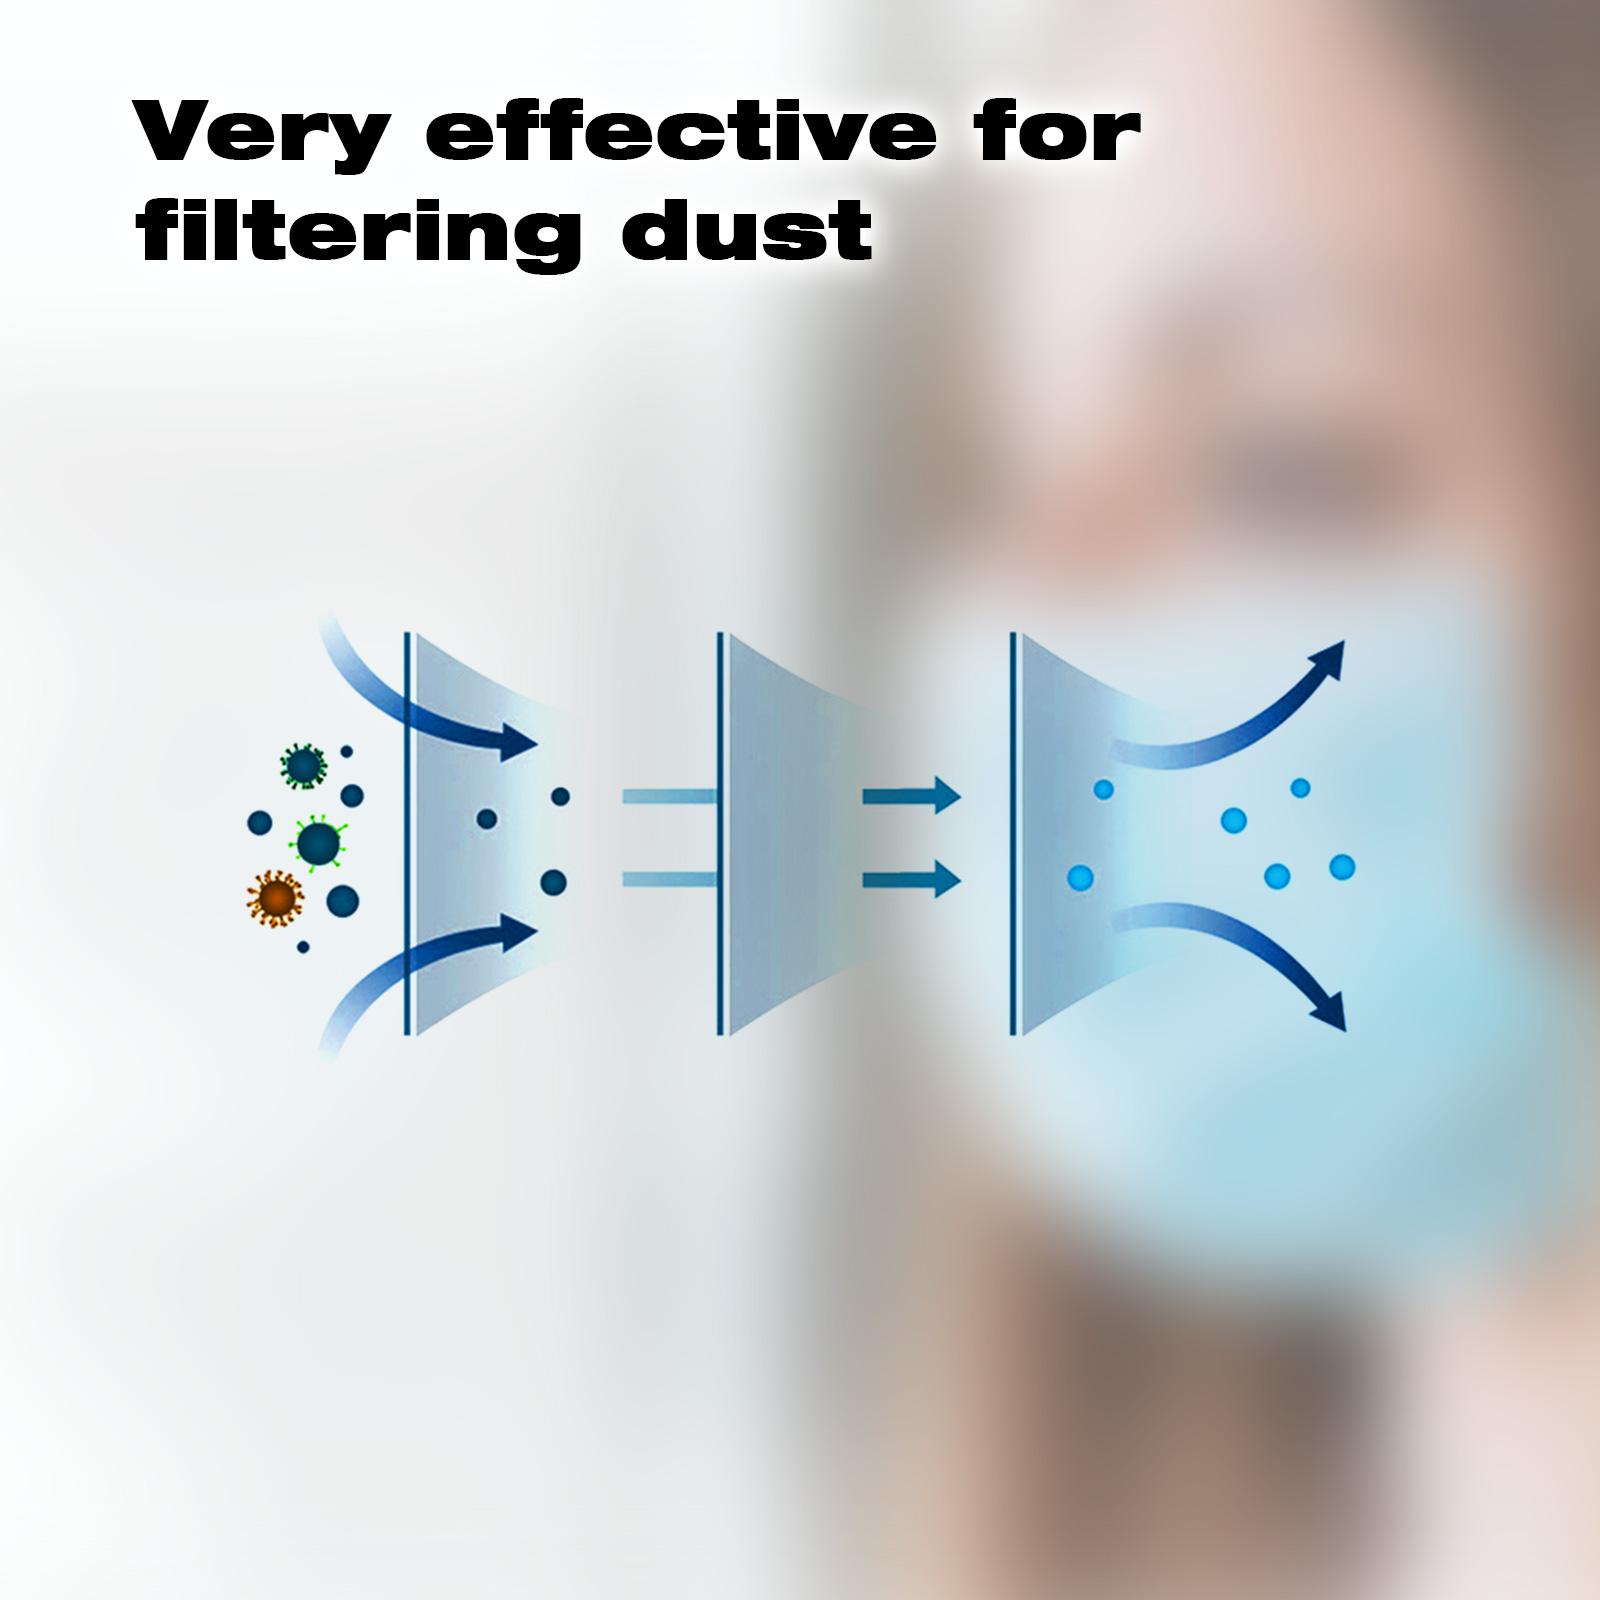 thumbnail 69 - 50/100pcs Disposable Face Mask Protective Mouth Masks 3 Layer Meltblown Filter